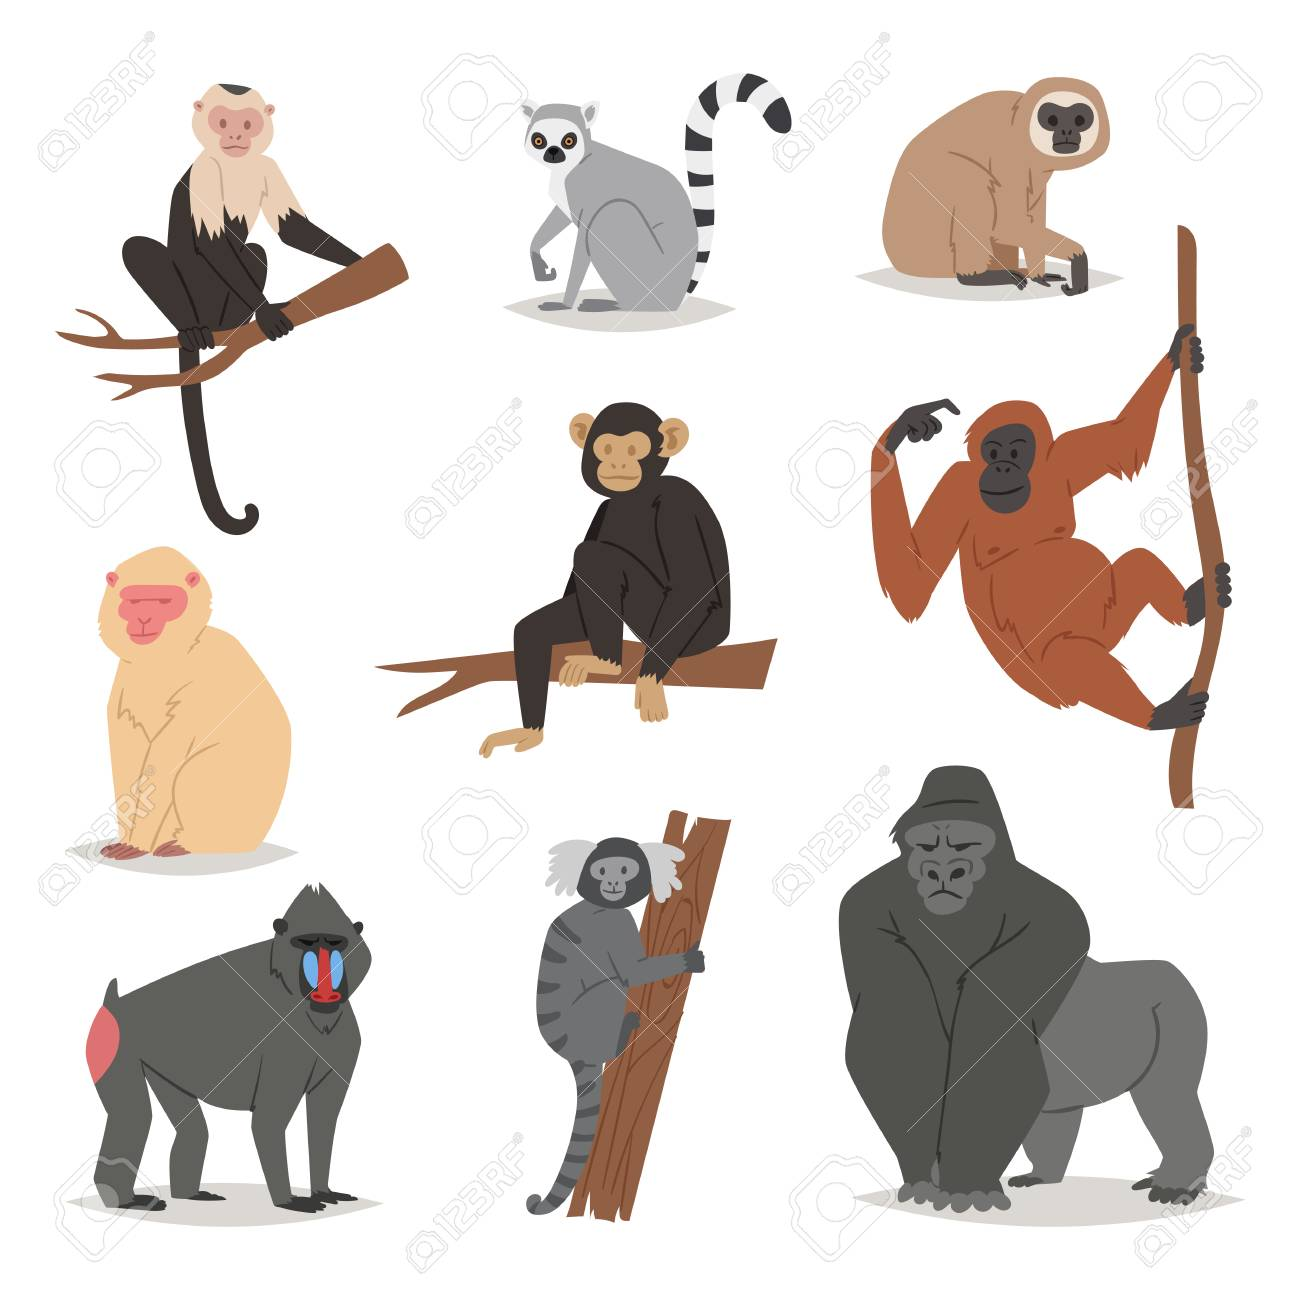 Monkey vector set cute animal macaque monkeyish cartoon character of primate chimpanzee, gibbon and babbon monkeyshines illustration isolated on white - 91176376